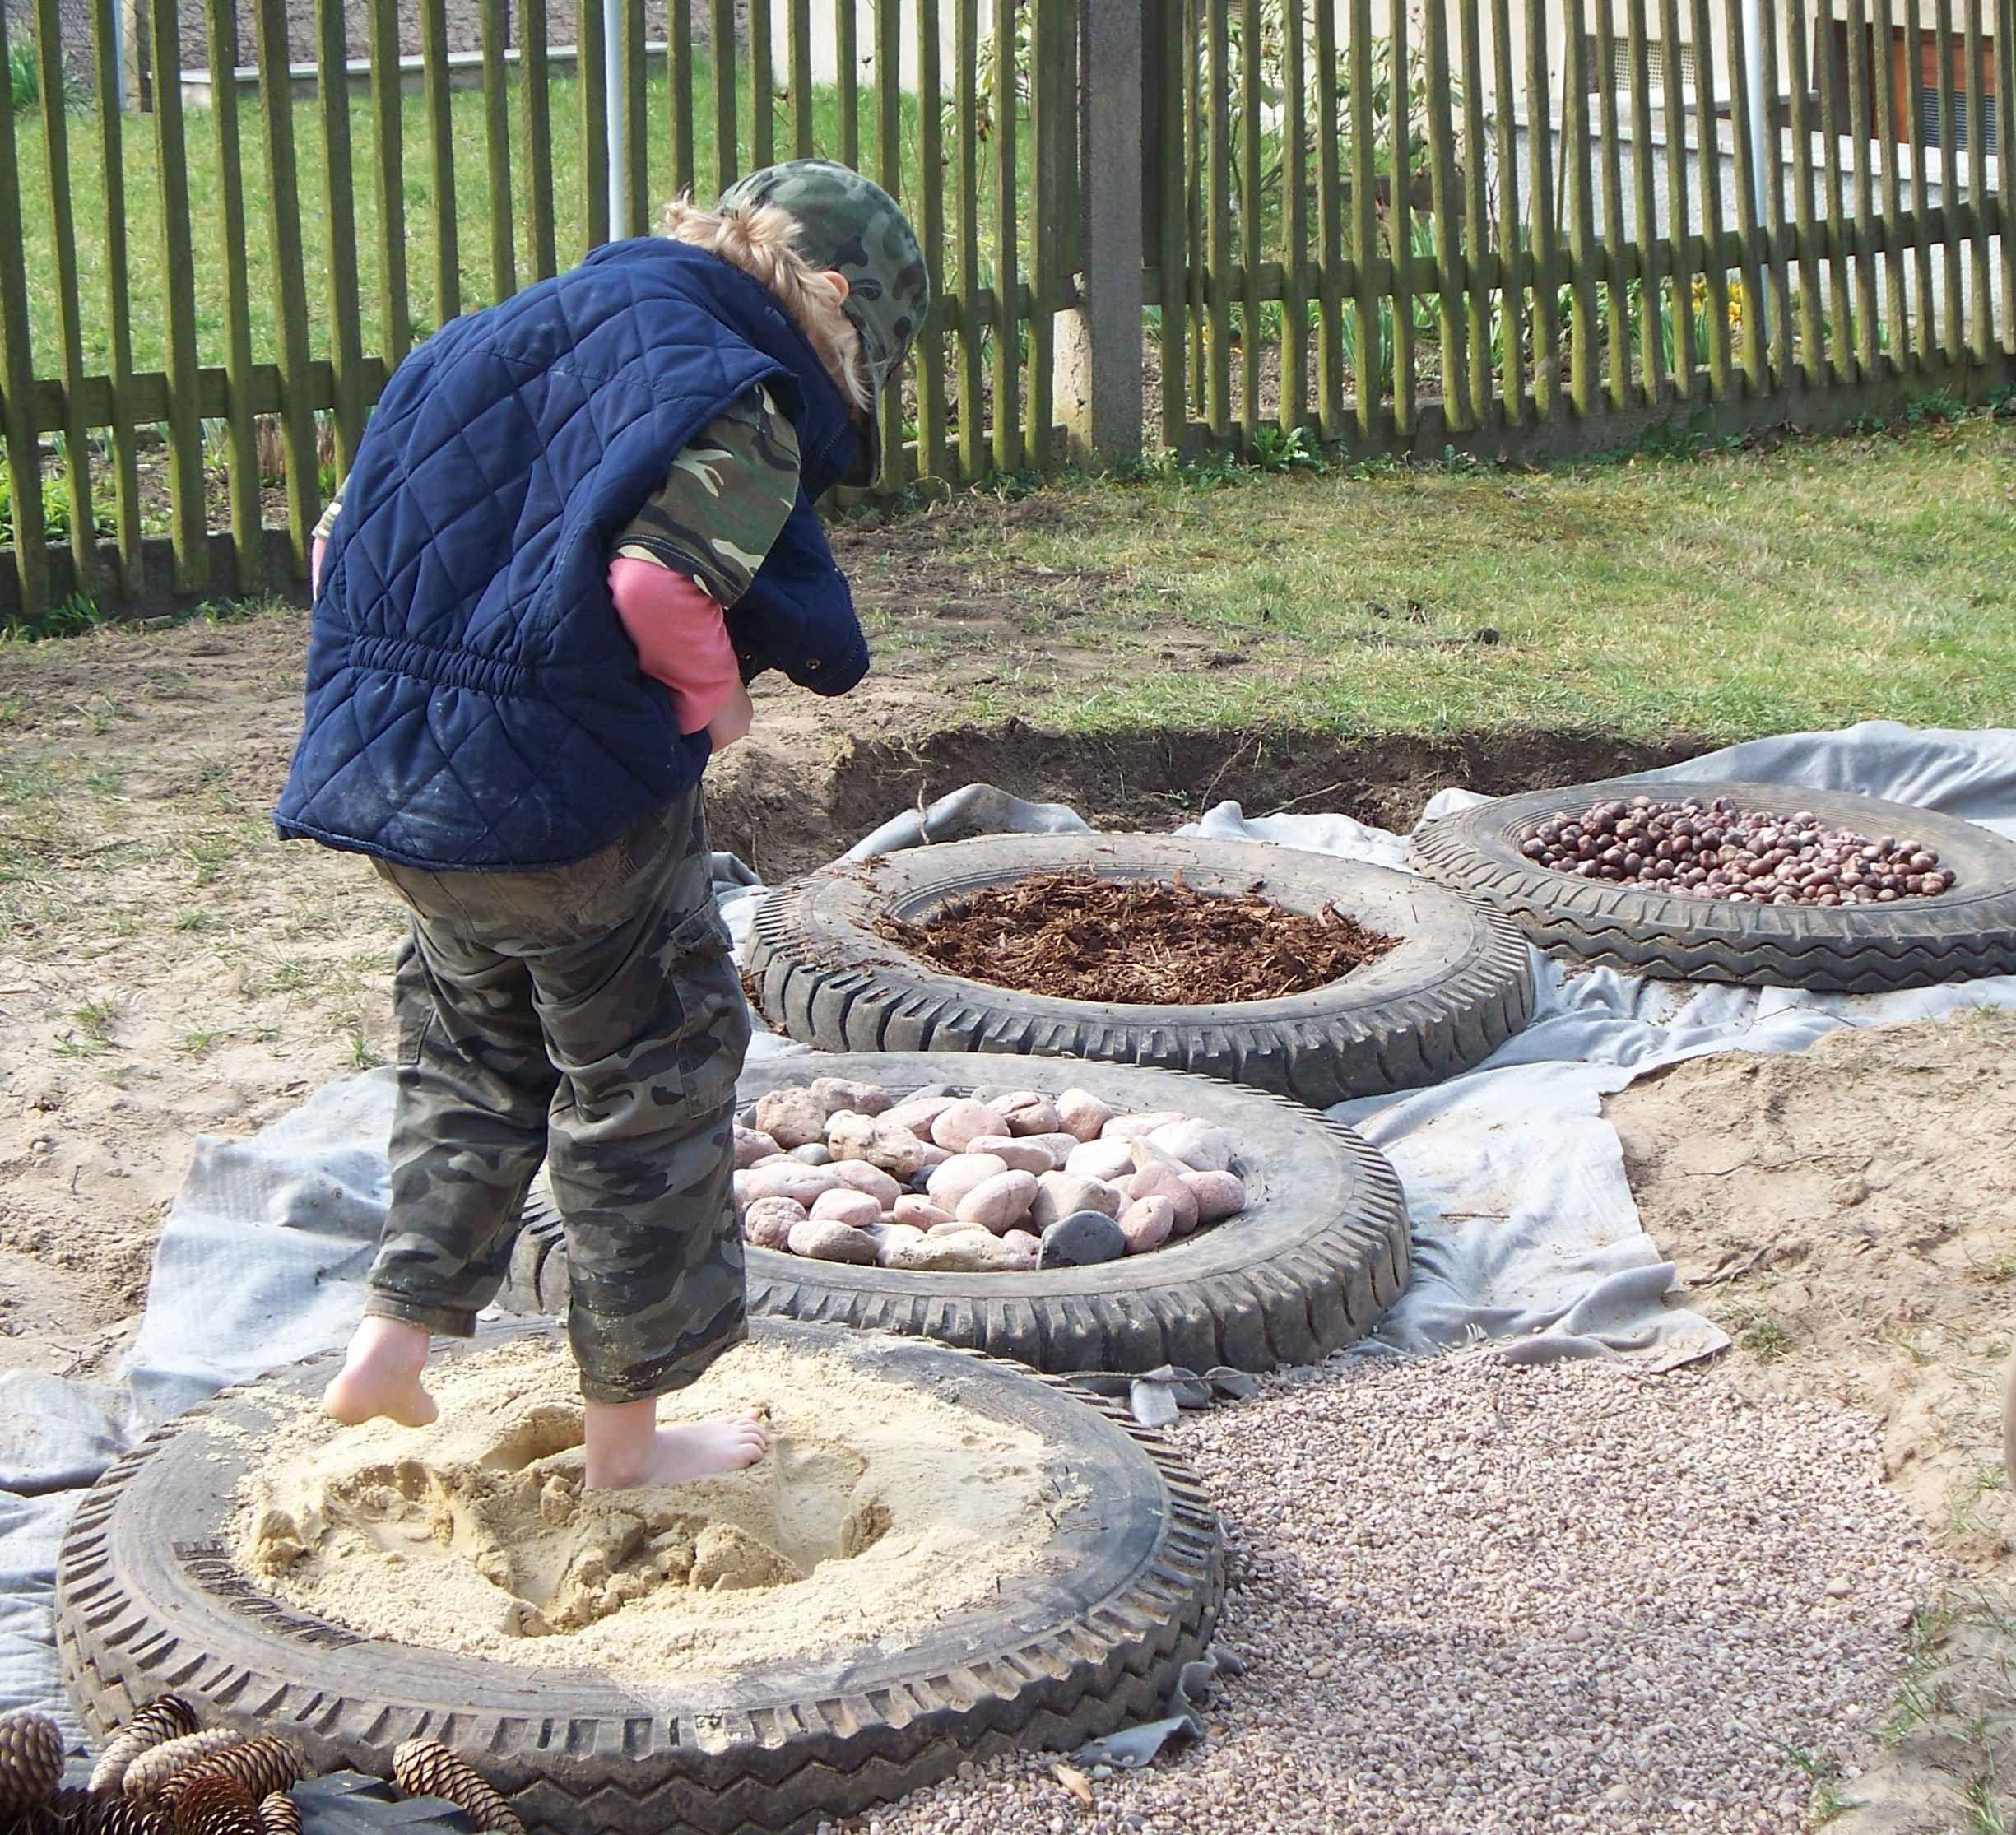 Barfusspfad - Fühlparcour | Kreative Ideen Arbeit | Pinterest ... Sandkasten Selber Bauen Ideen Tipps Garten Kinder Spiel